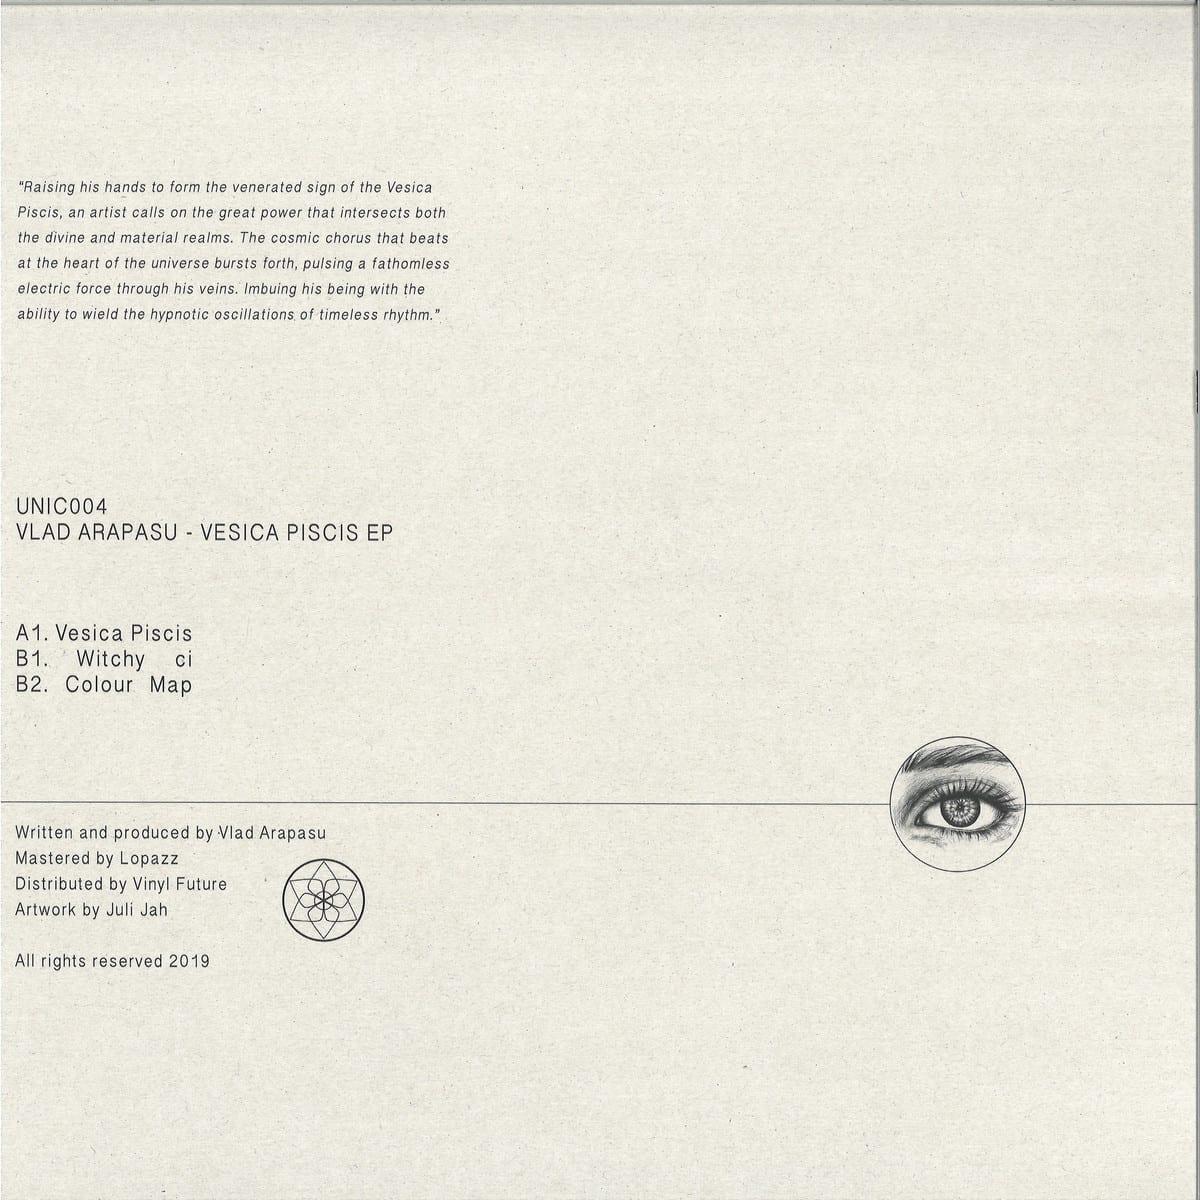 Vlad Arapasu - Vesica Piscis EP [Unic] 02